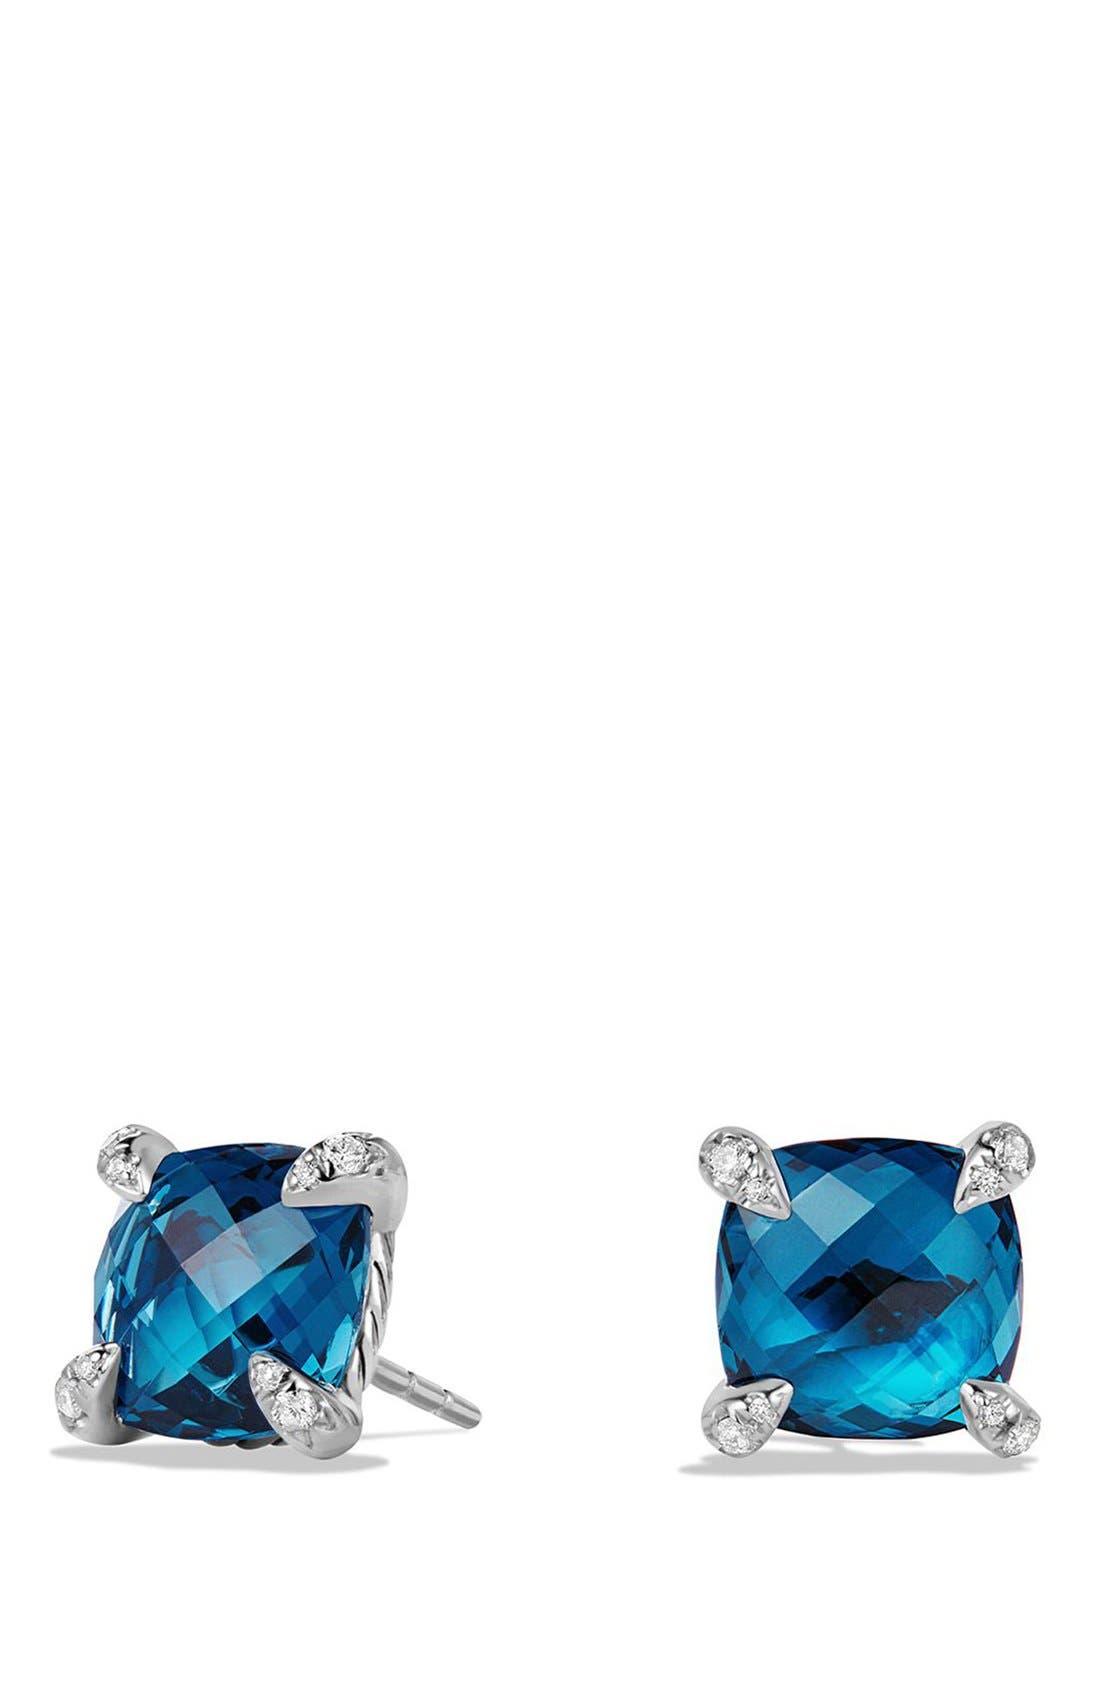 'Châtelaine' Earrings with Semiprecious Stones and Diamonds,                             Main thumbnail 1, color,                             SILVER/ HAMPTON BLUE TOPAZ